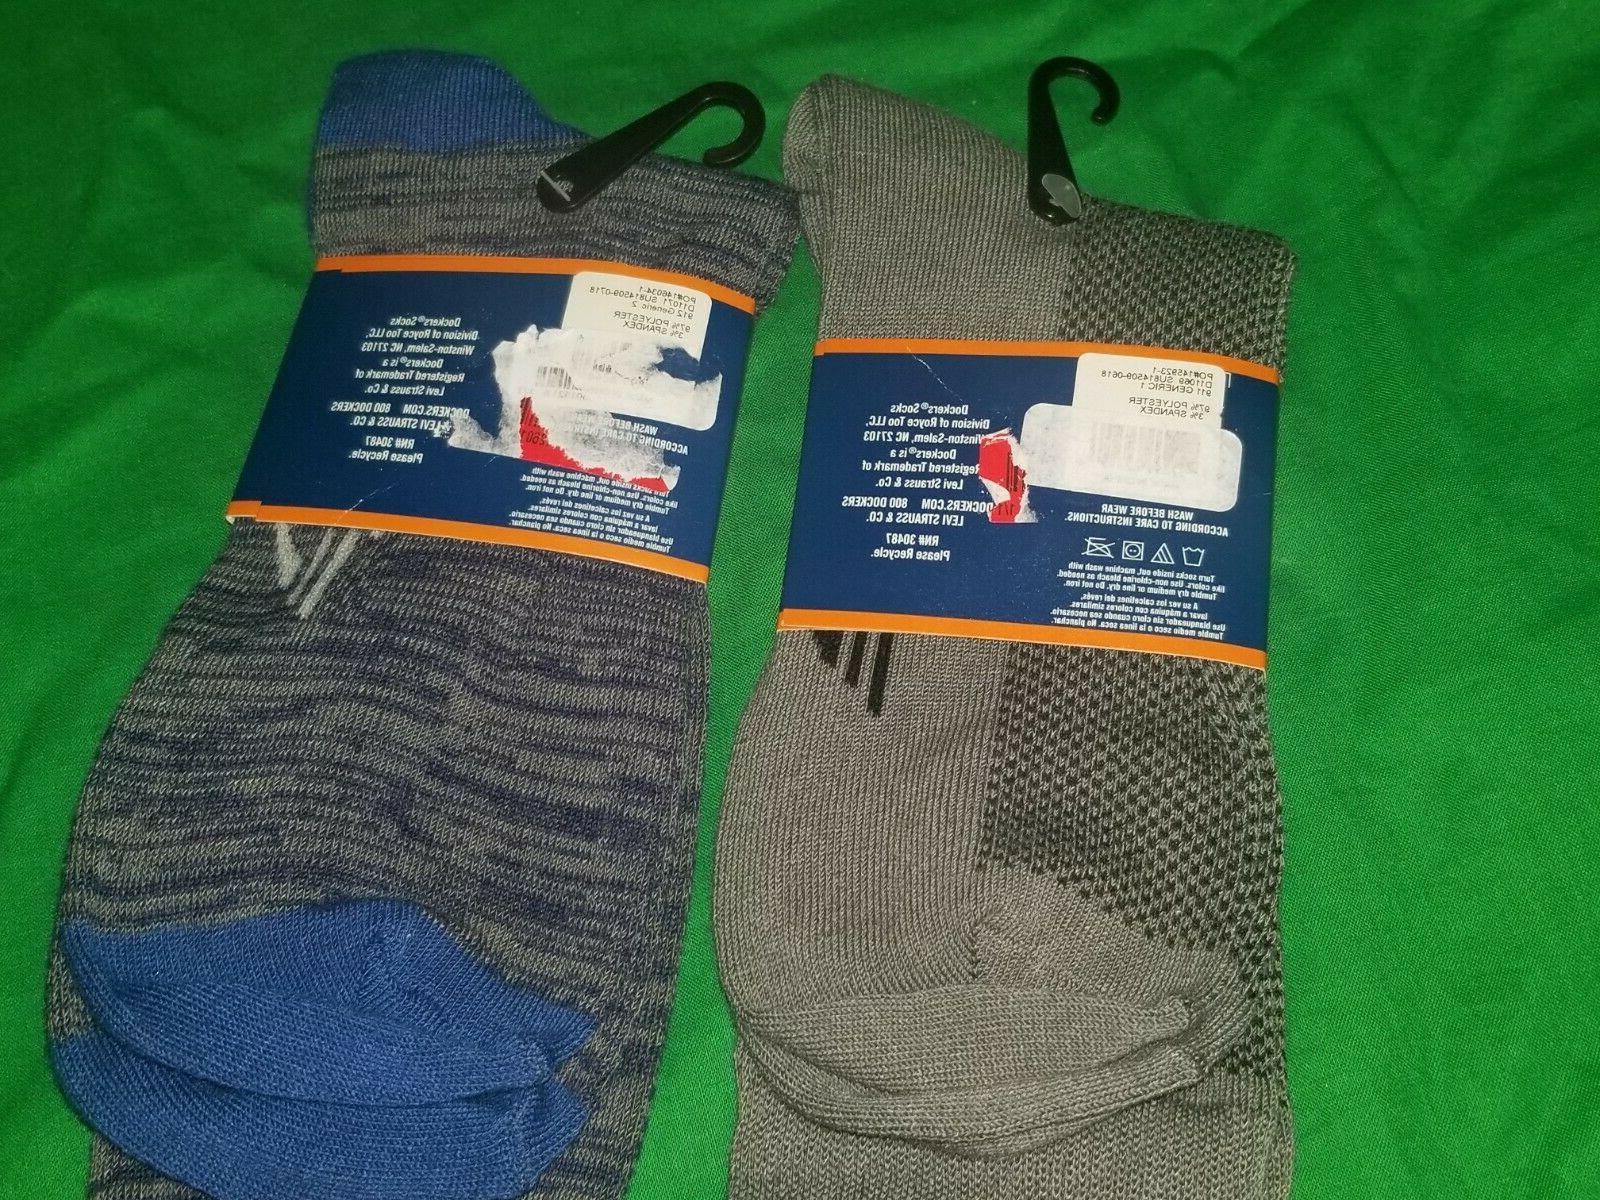 Dockers Dress 2 Gray & Size 6-12 Blend